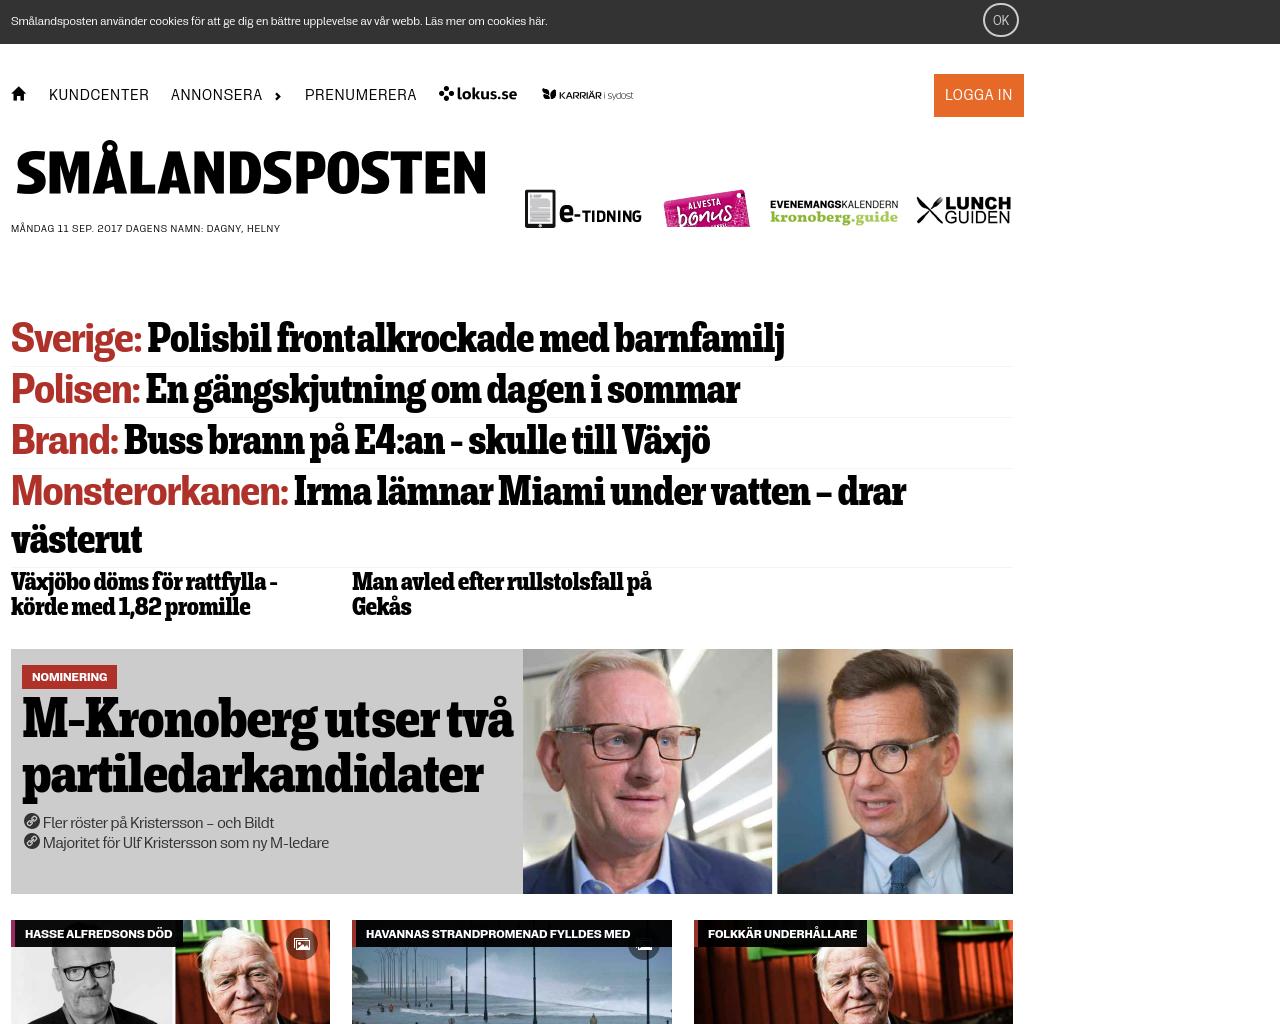 SMP.se---Smålandsposten-Advertising-Reviews-Pricing